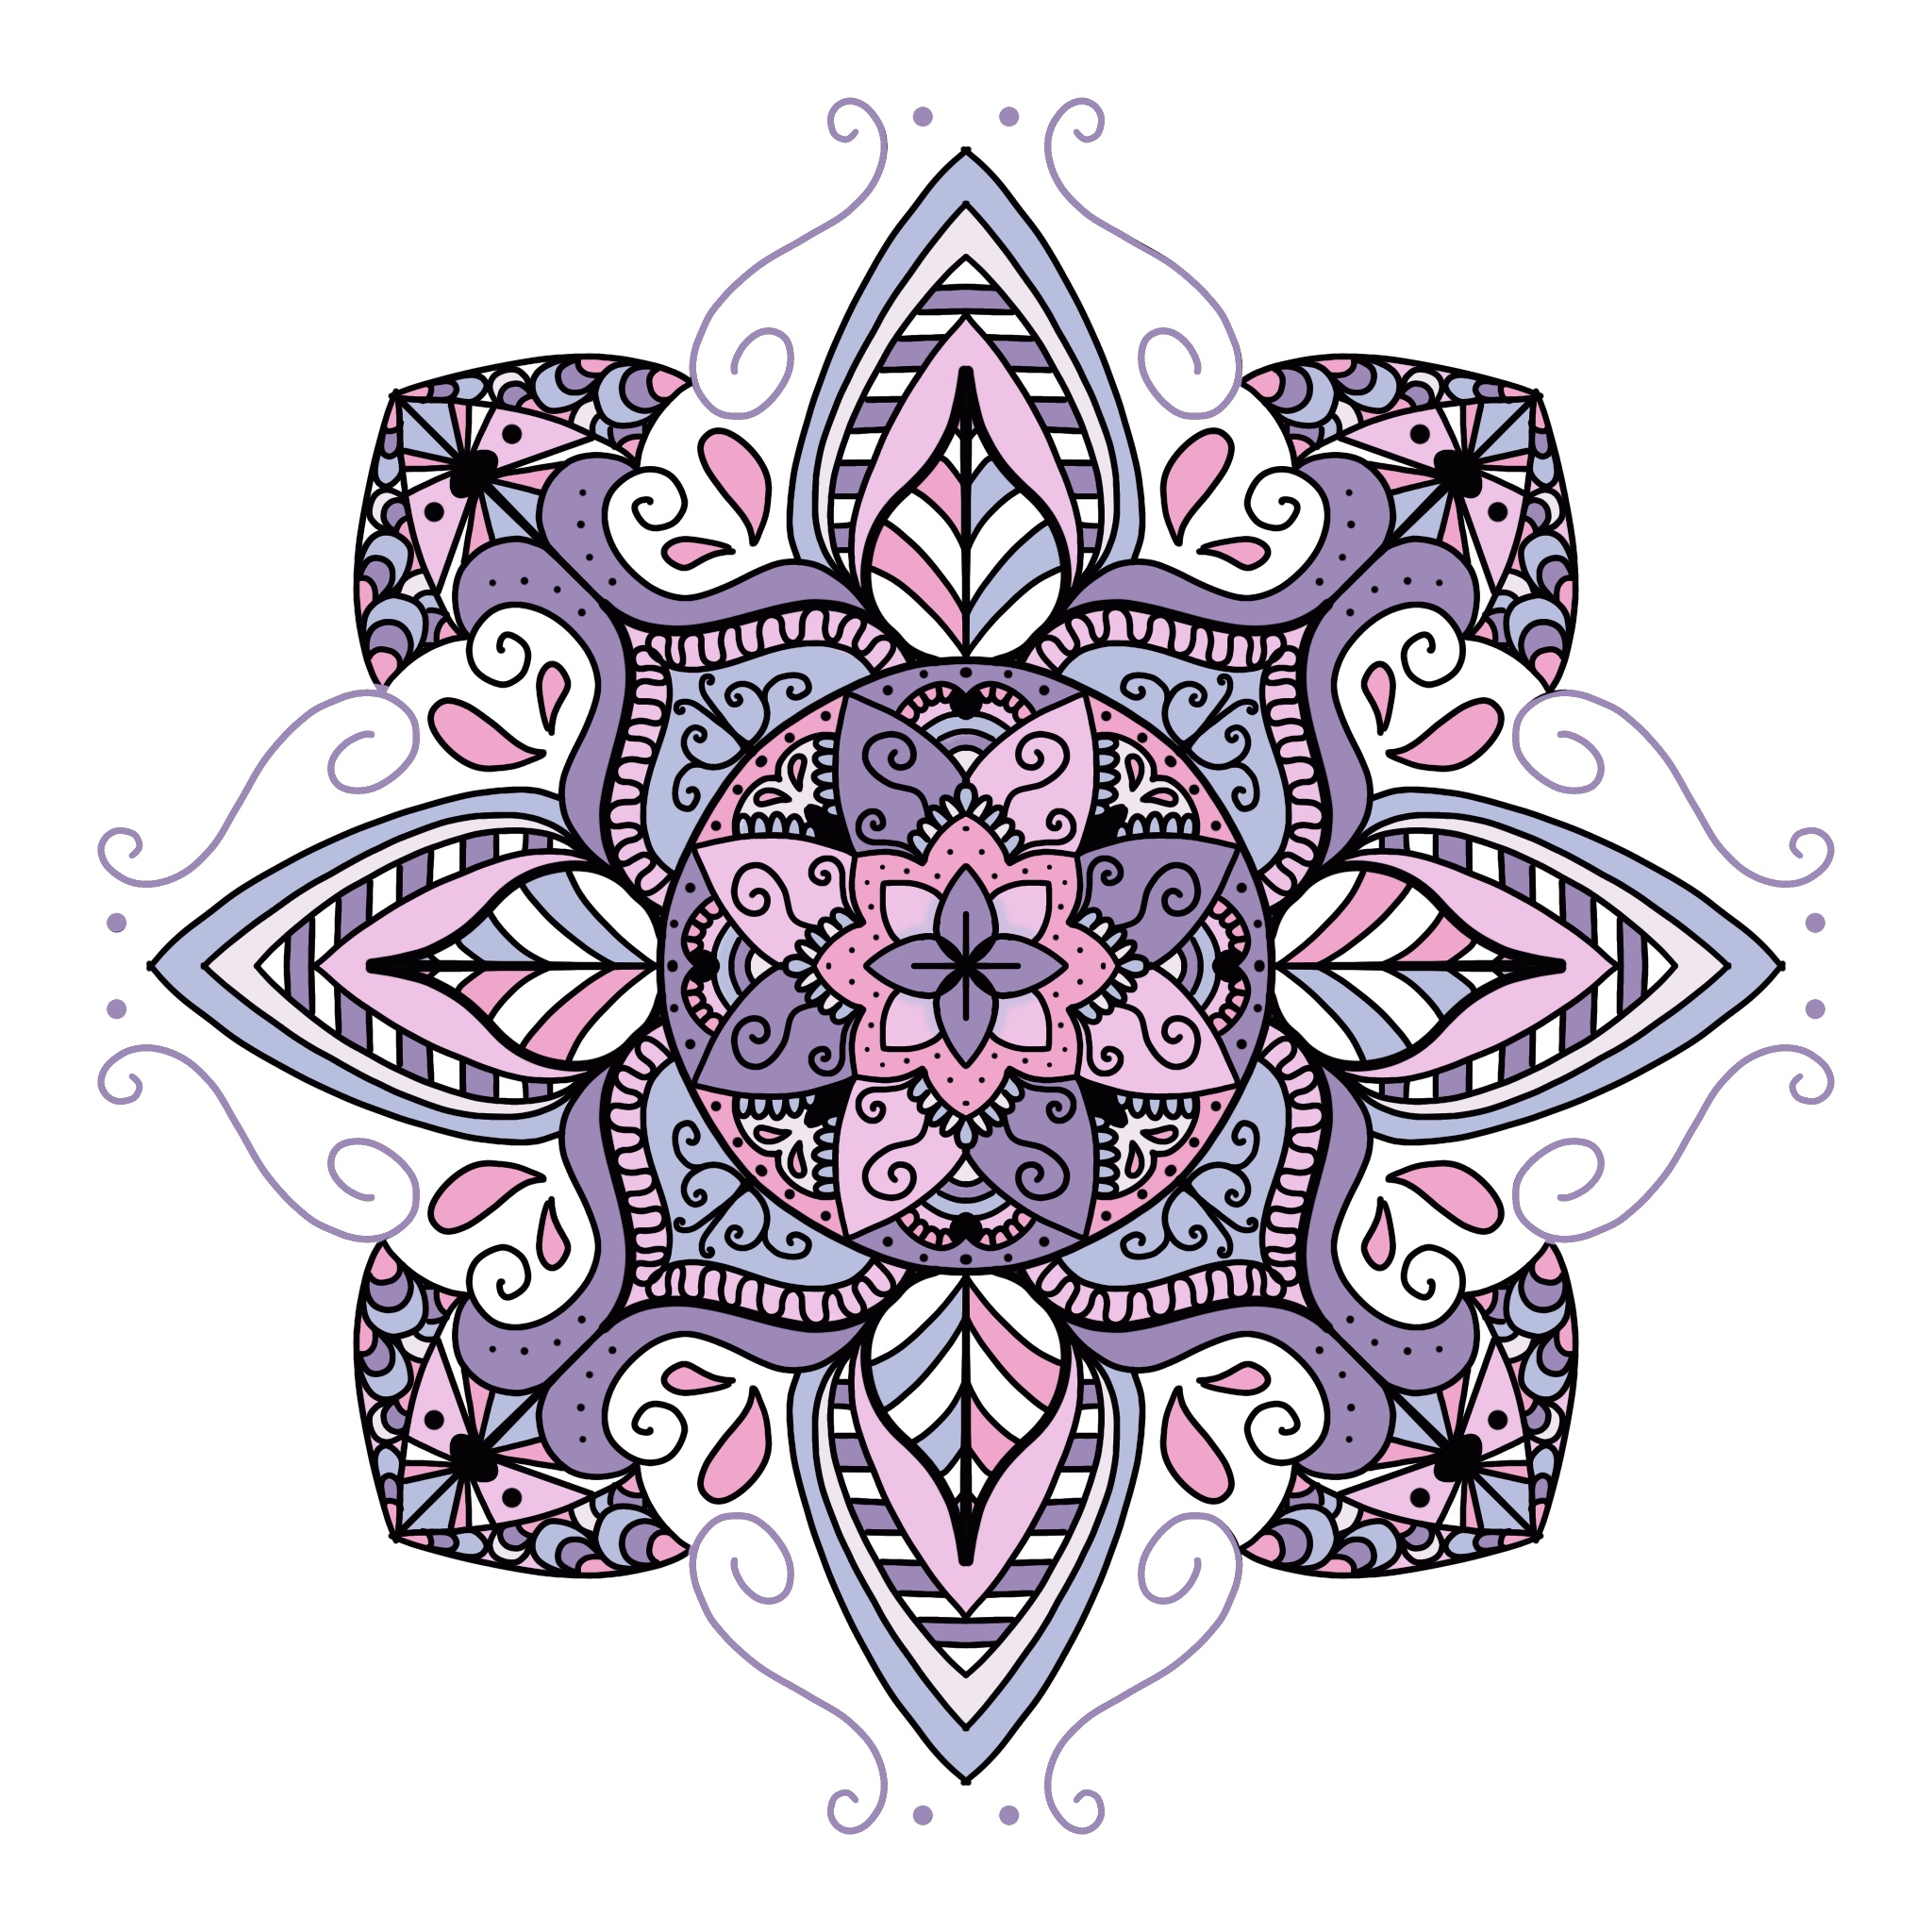 Mandala_27_Colored